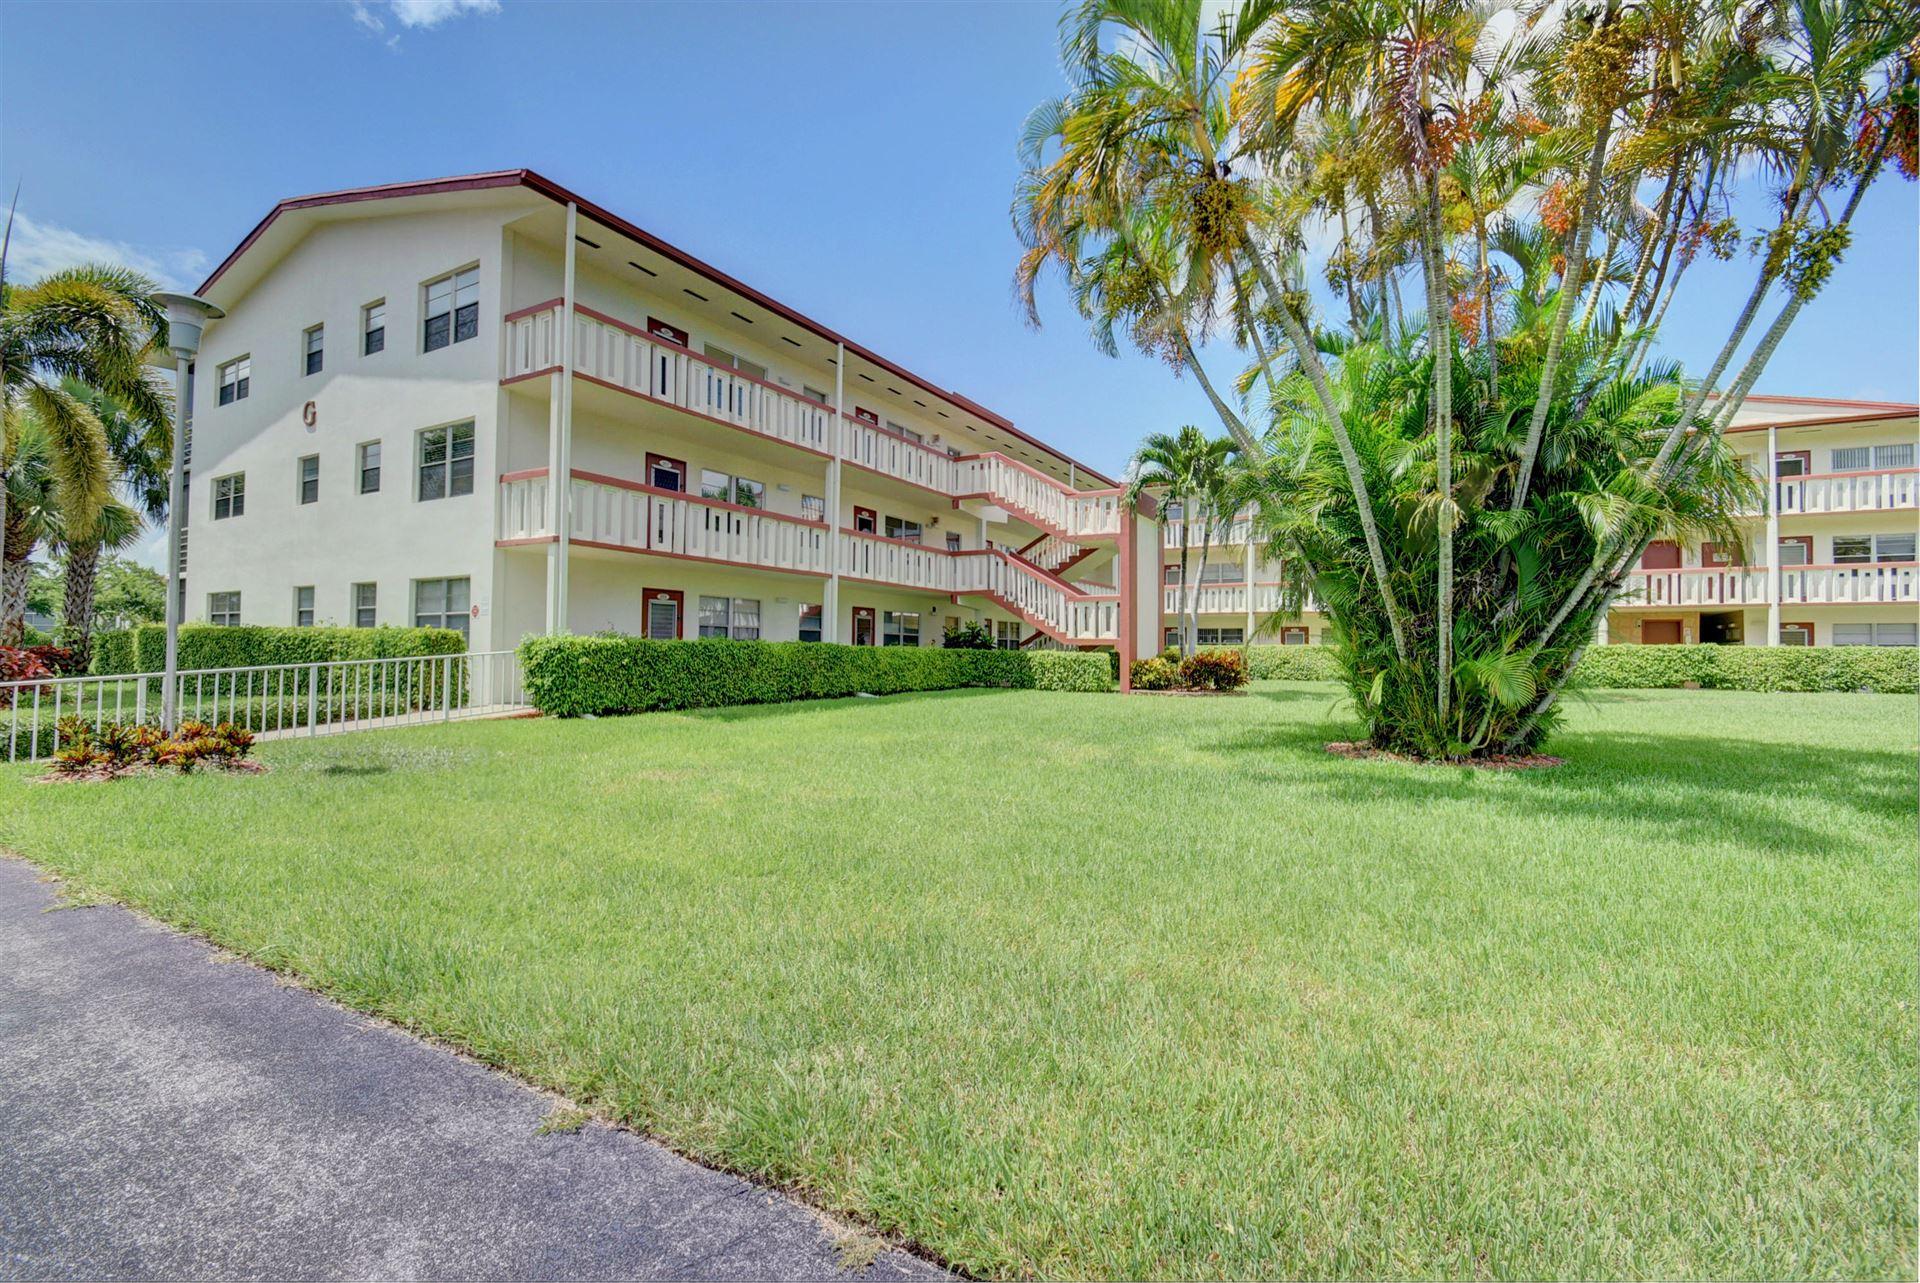 276 Brighton G, Boca Raton, FL 33434 - MLS#: RX-10714203